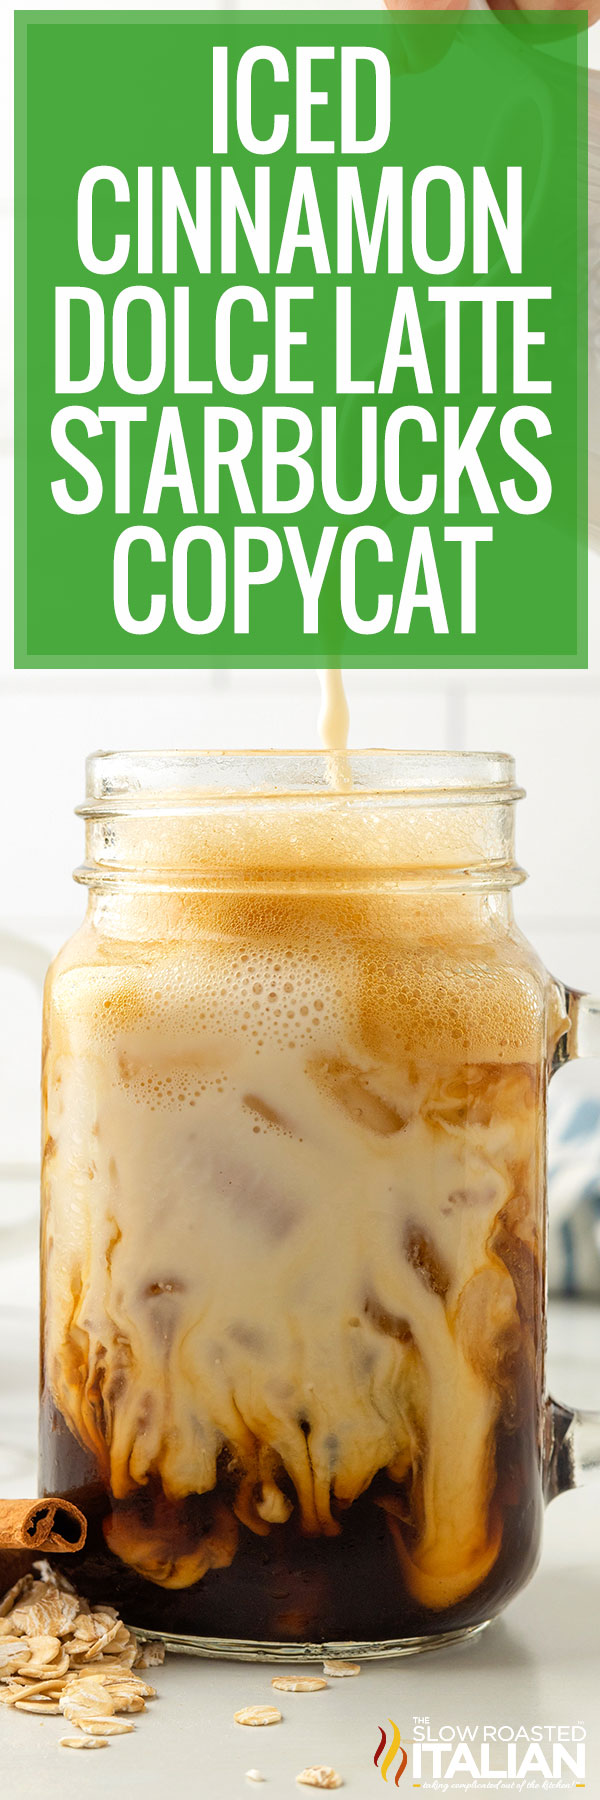 Iced Cinnamon Dolce Latte (Starbucks Copycat) closeup